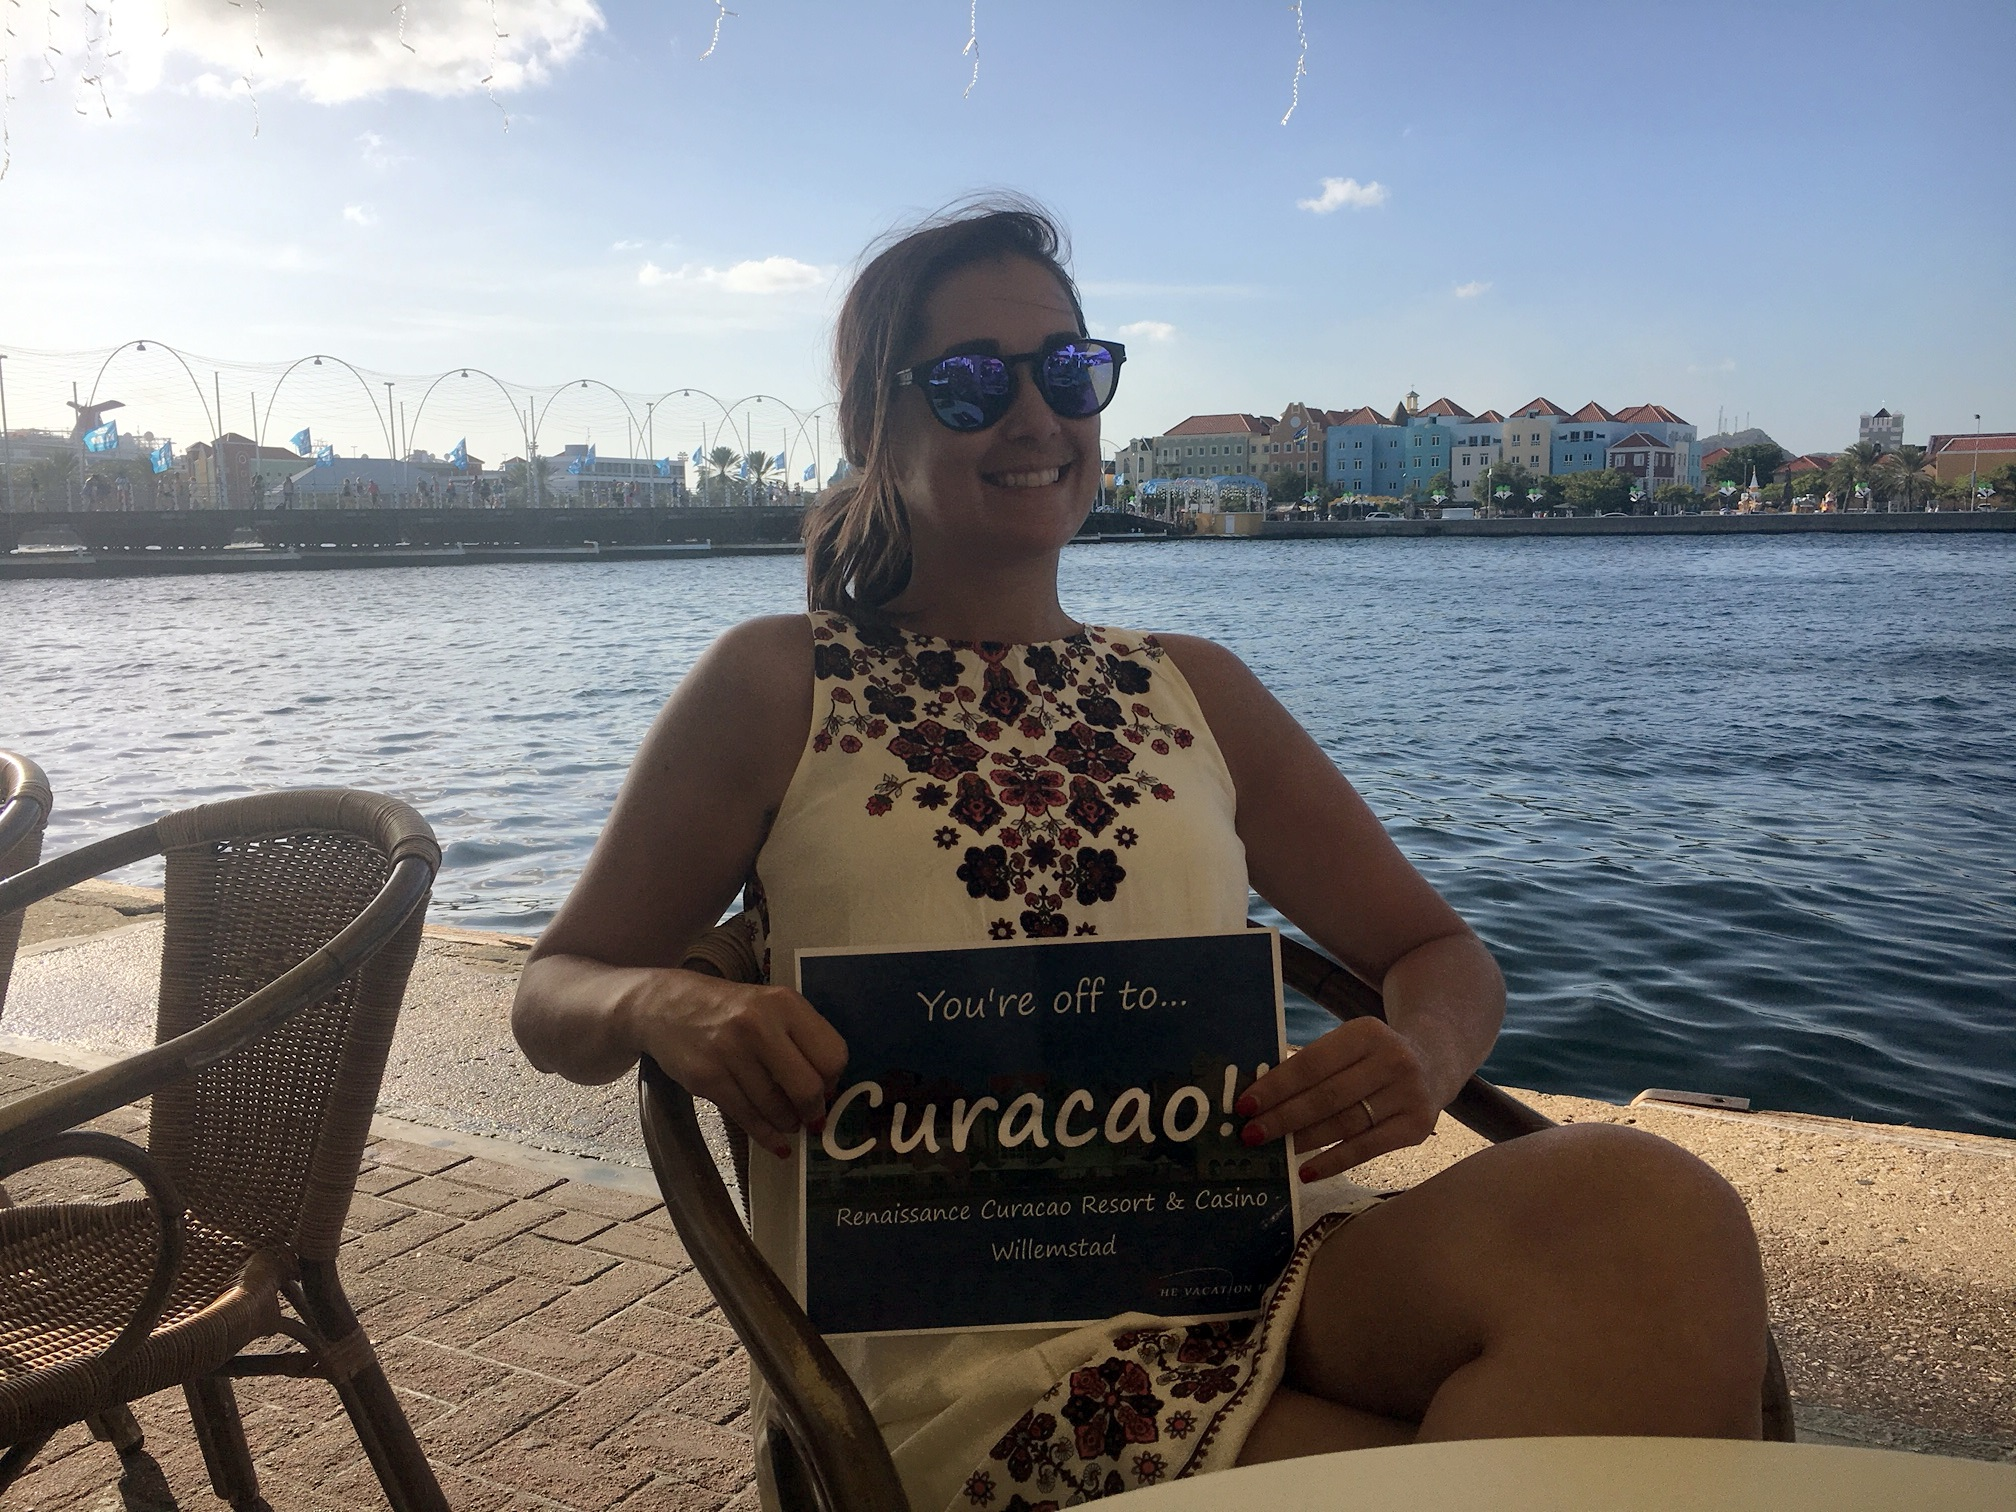 Curacao Sign Pic.jpg